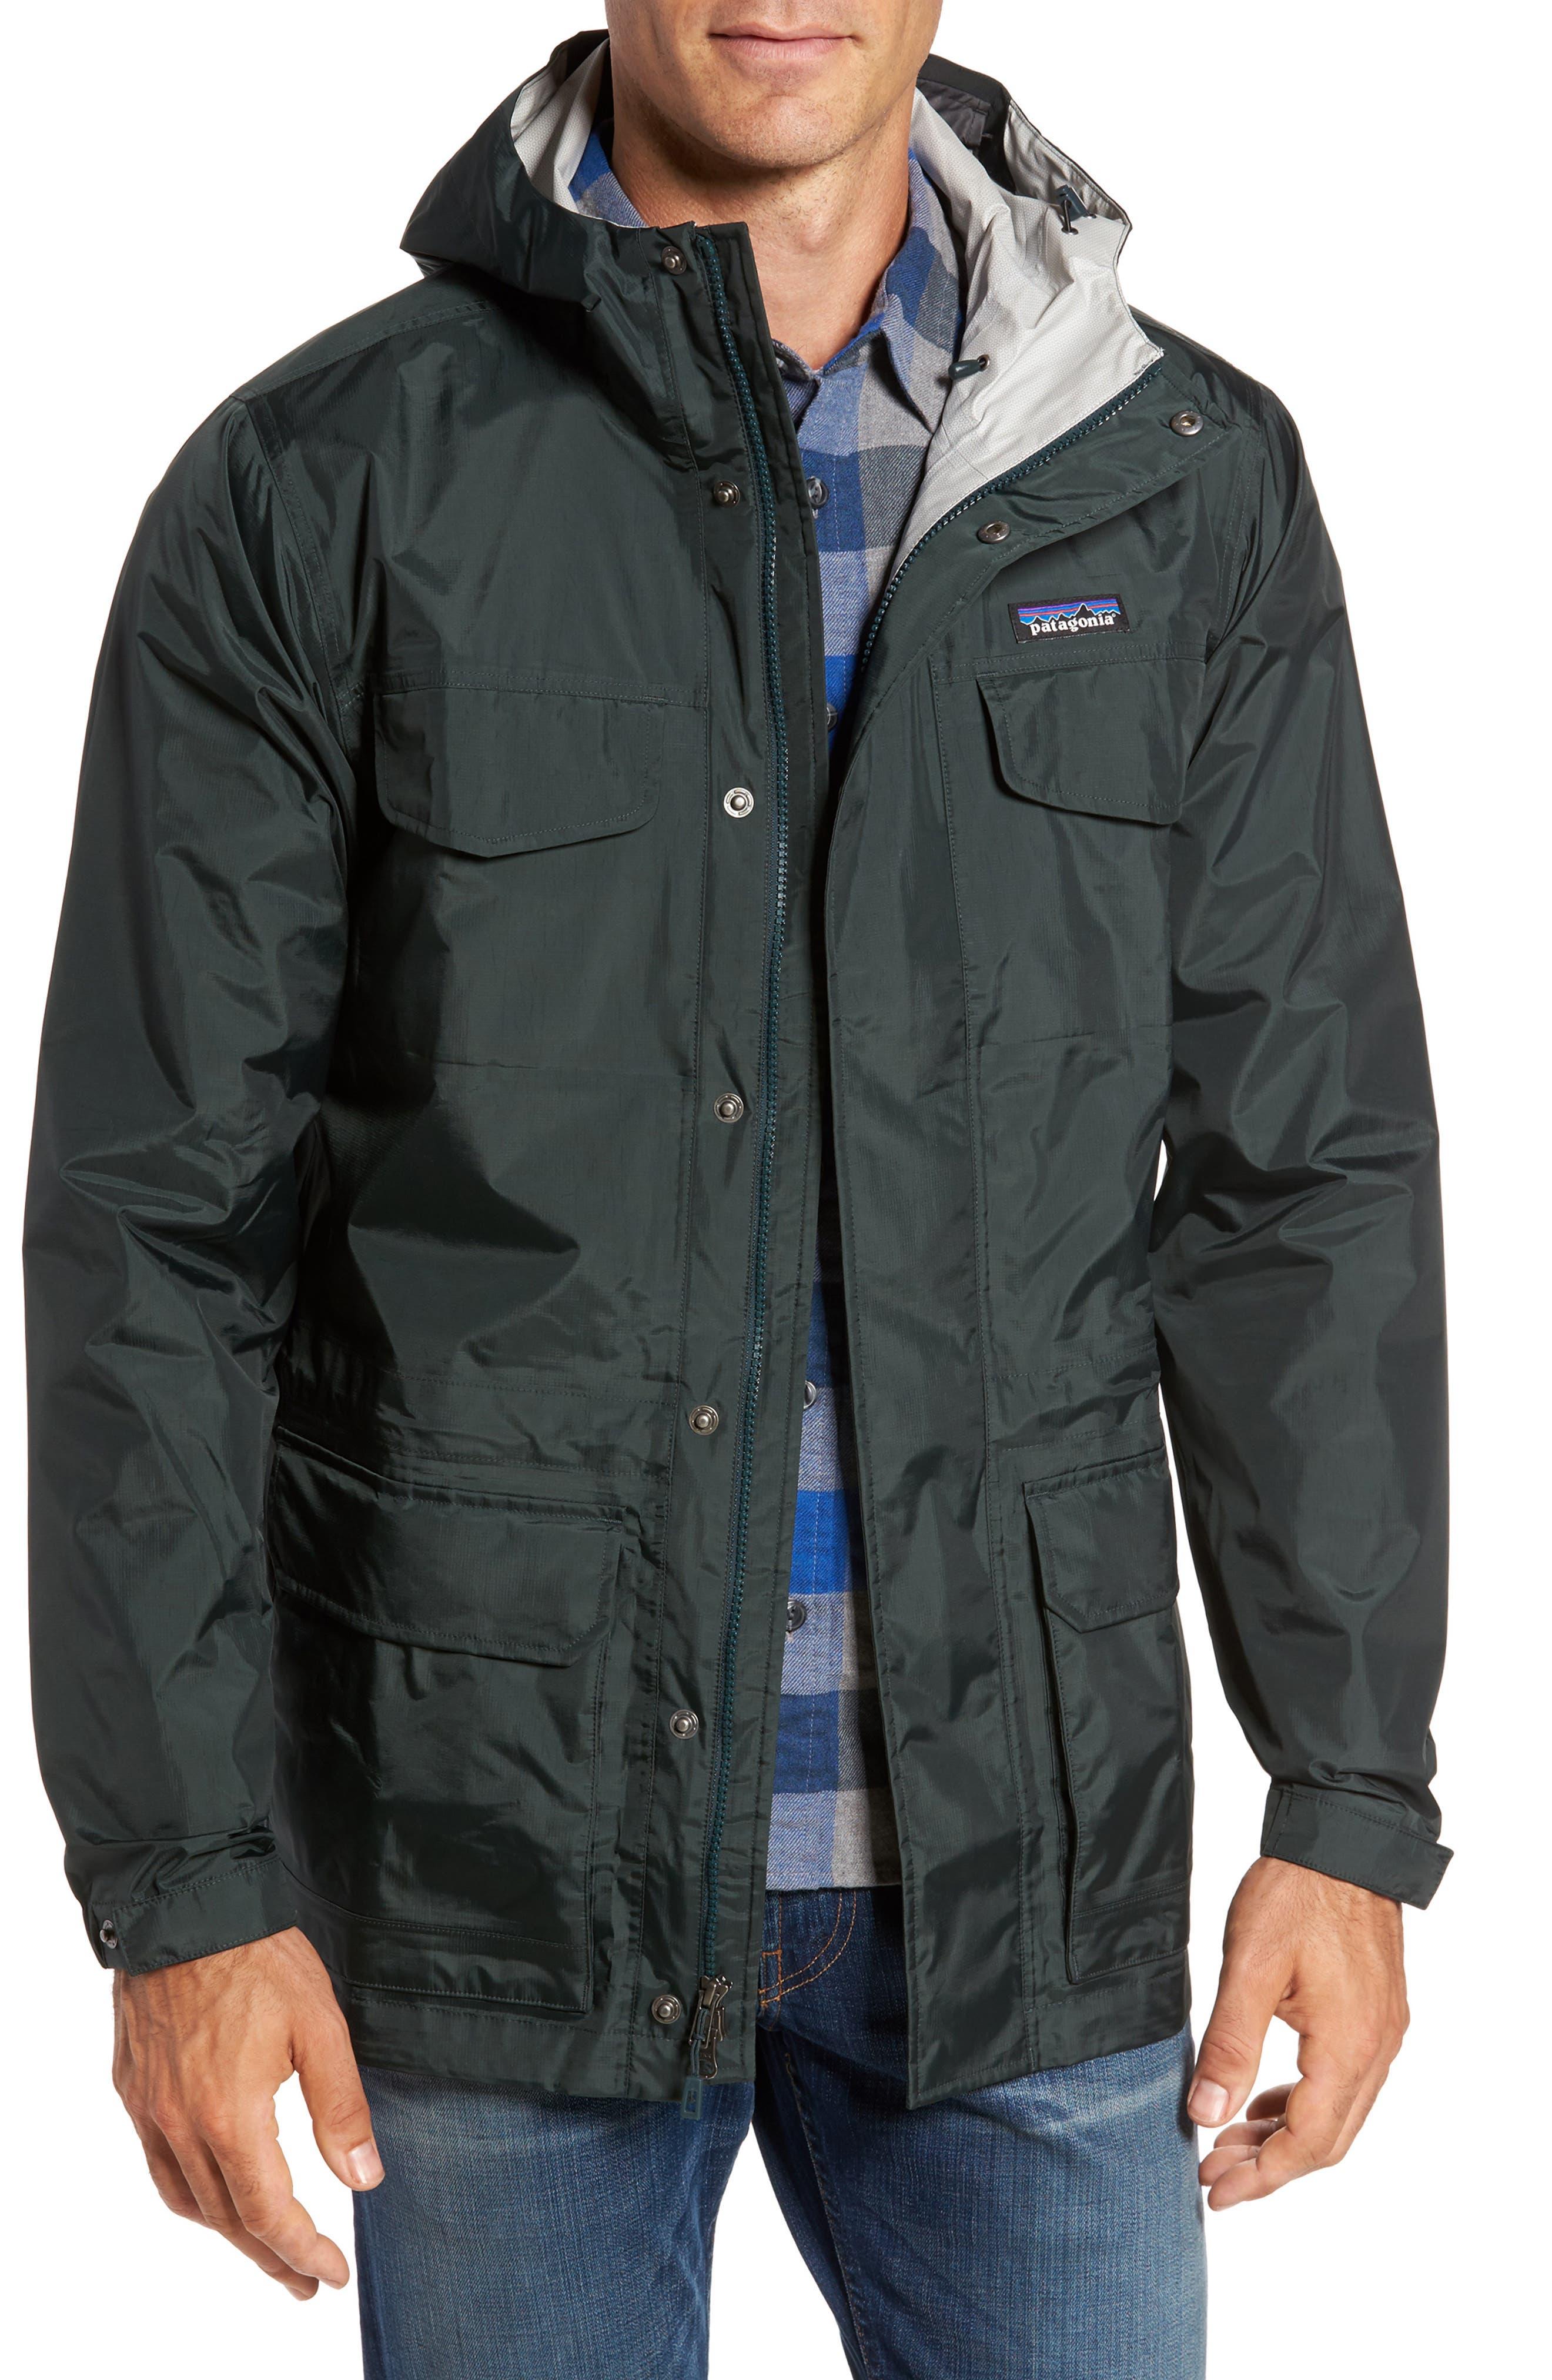 Torrentshell Waterproof Jacket,                             Main thumbnail 1, color,                             001